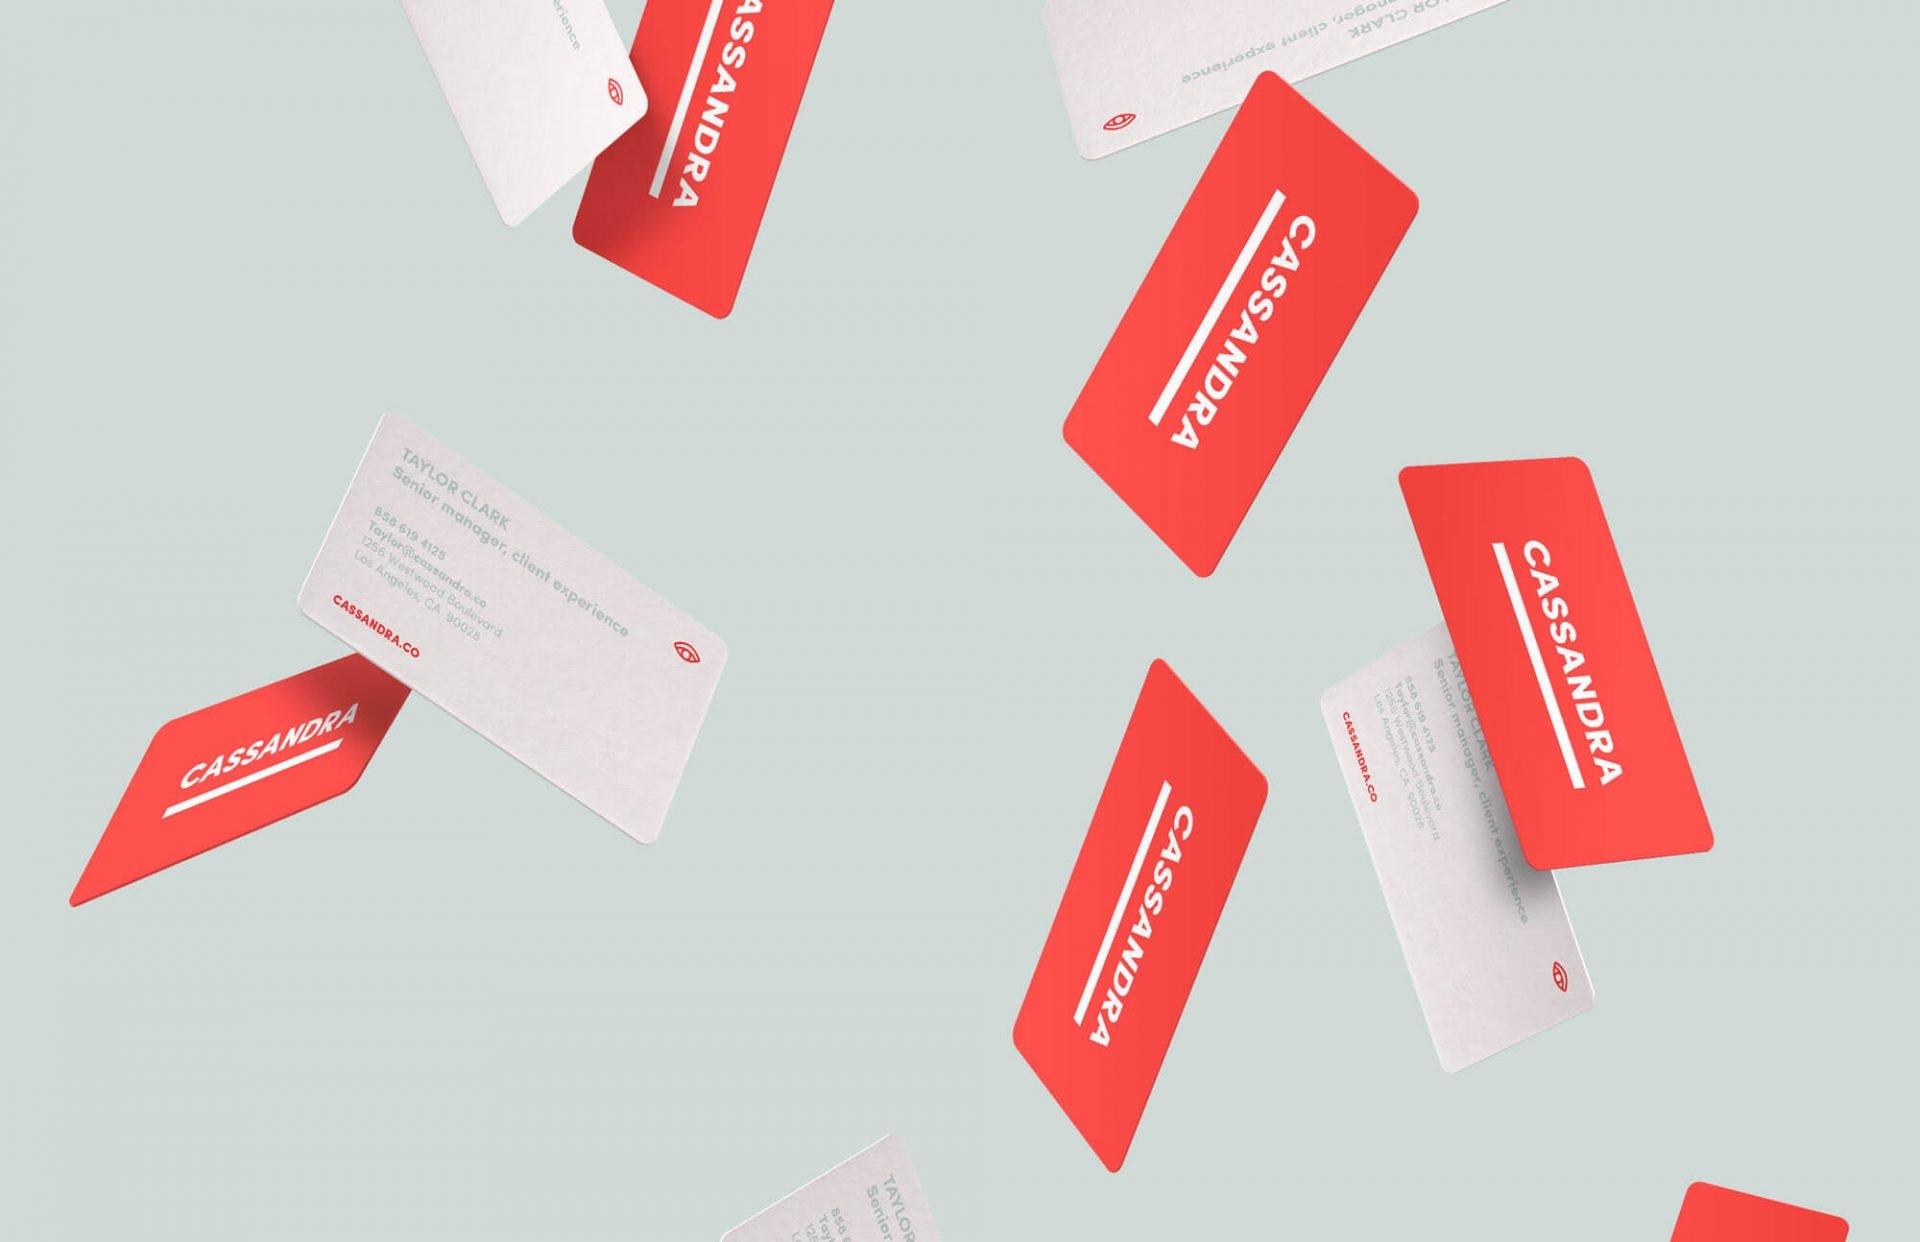 001_Cards_Cassandra_1